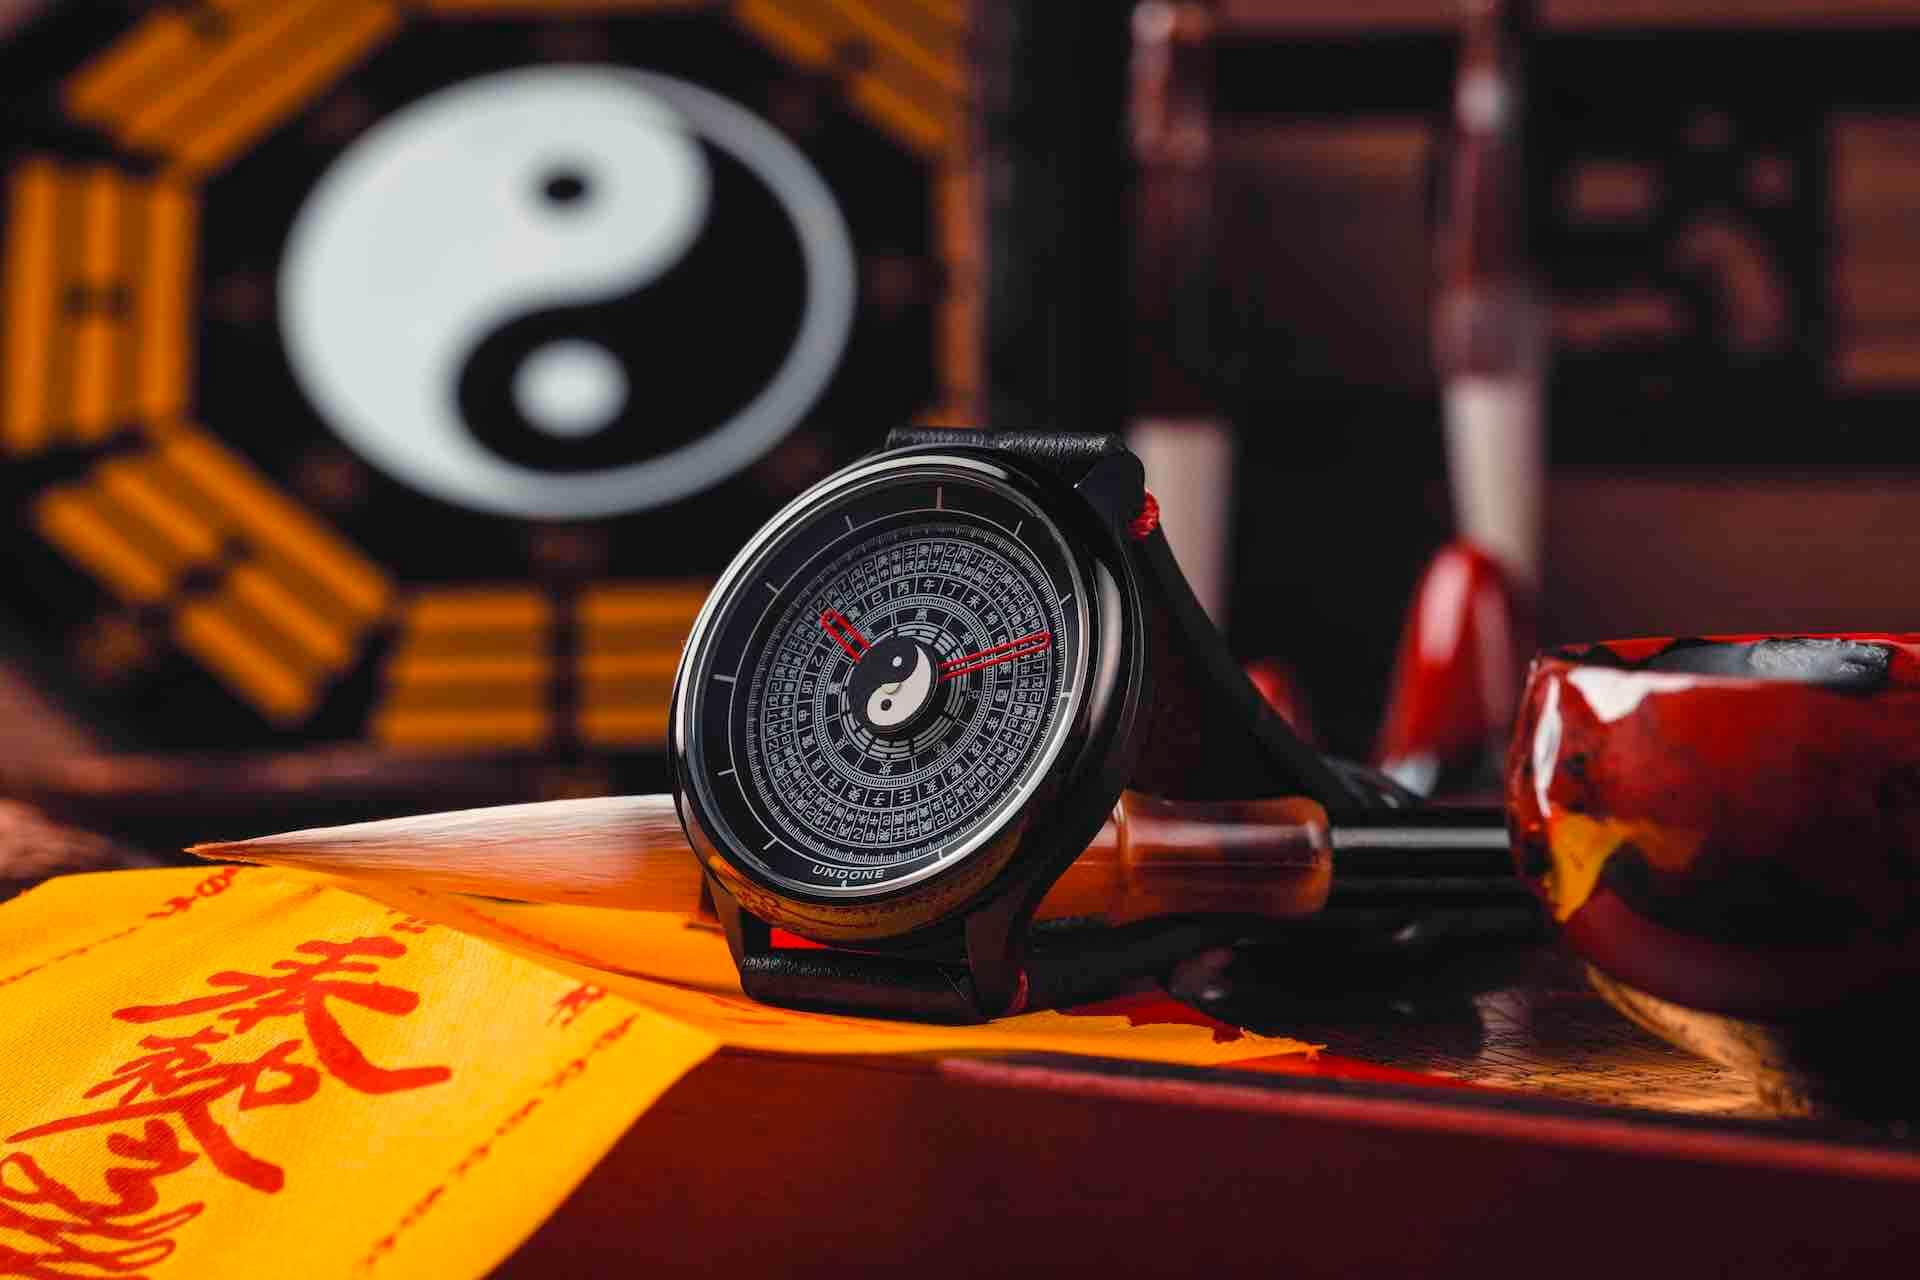 UNDONEから羅盤や風水コンパスを近代的にアレンジした腕時計が登場!ケースバックには十干十二支がプリント lf200623_undone_zen_05